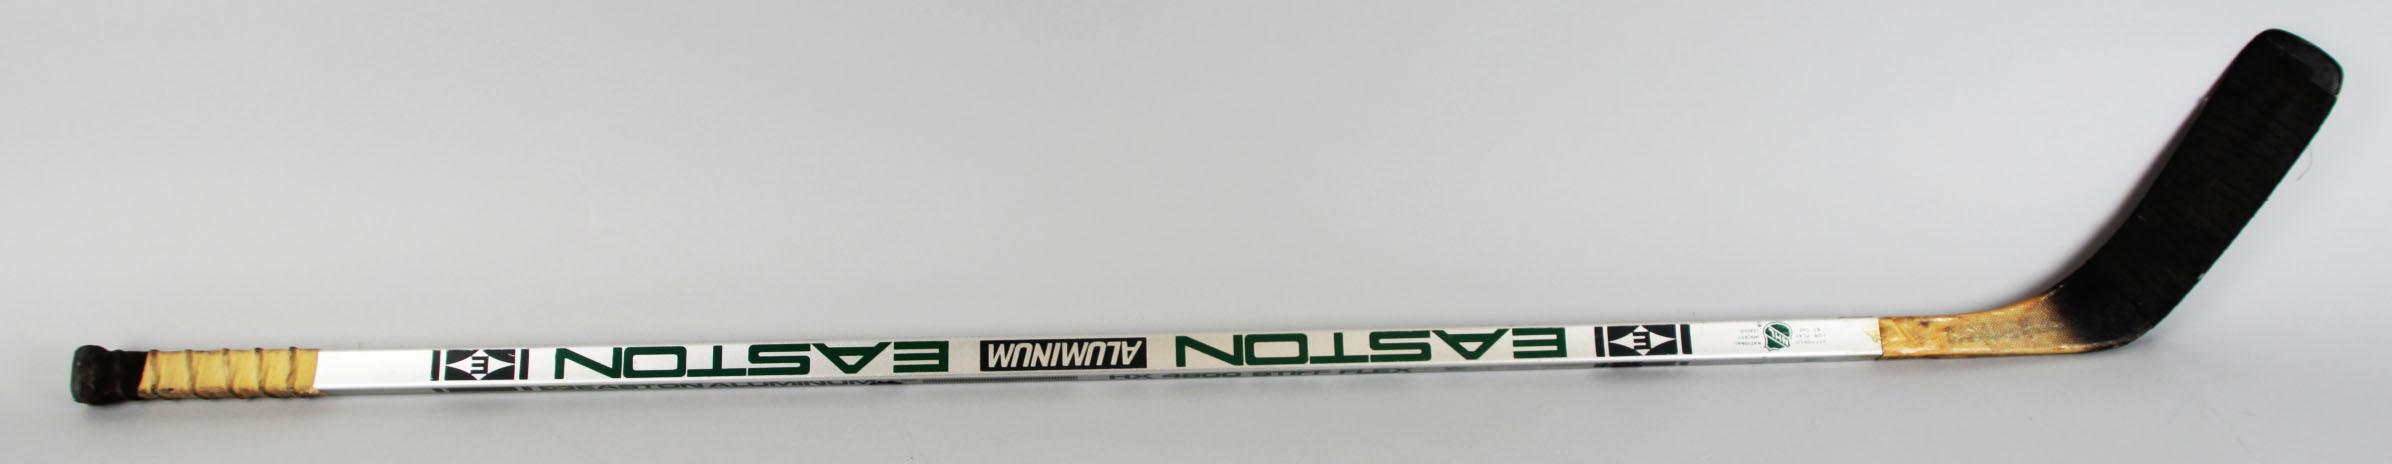 1985-86 Los Angeles Kings – Garry Galley Game-Used Hockey Stick – COA65554_01